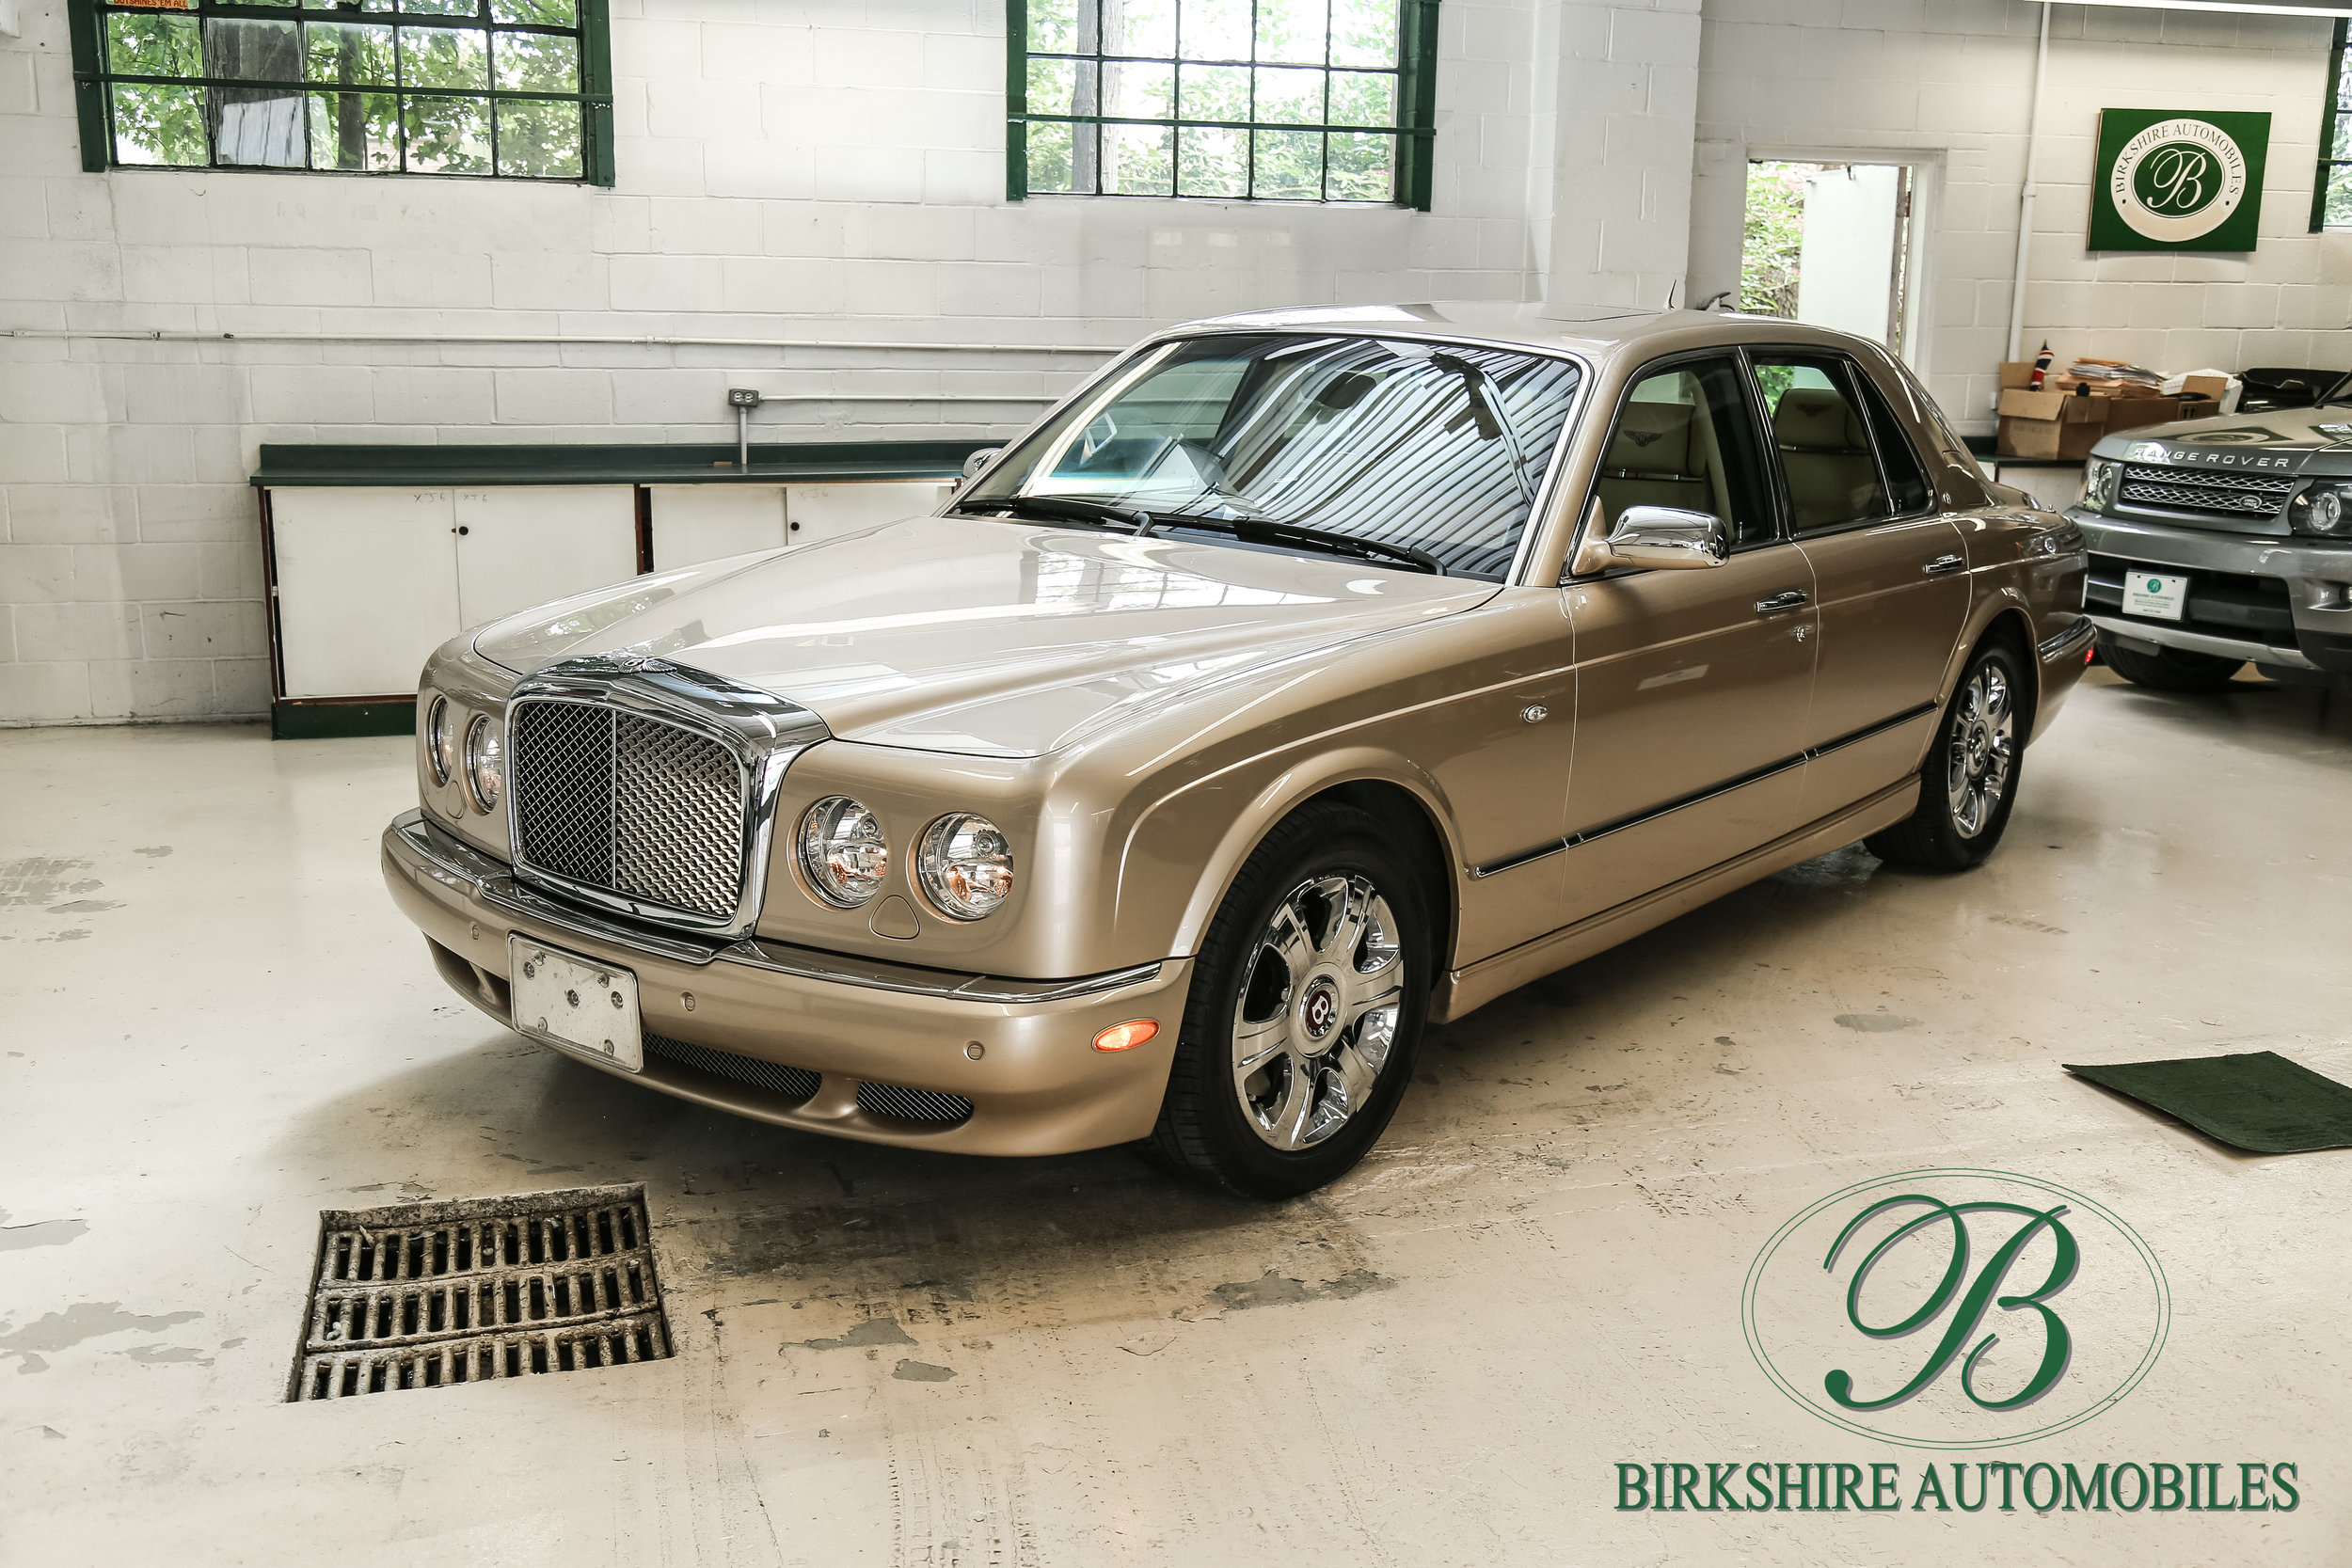 Birkshire Automobiles-320.jpg